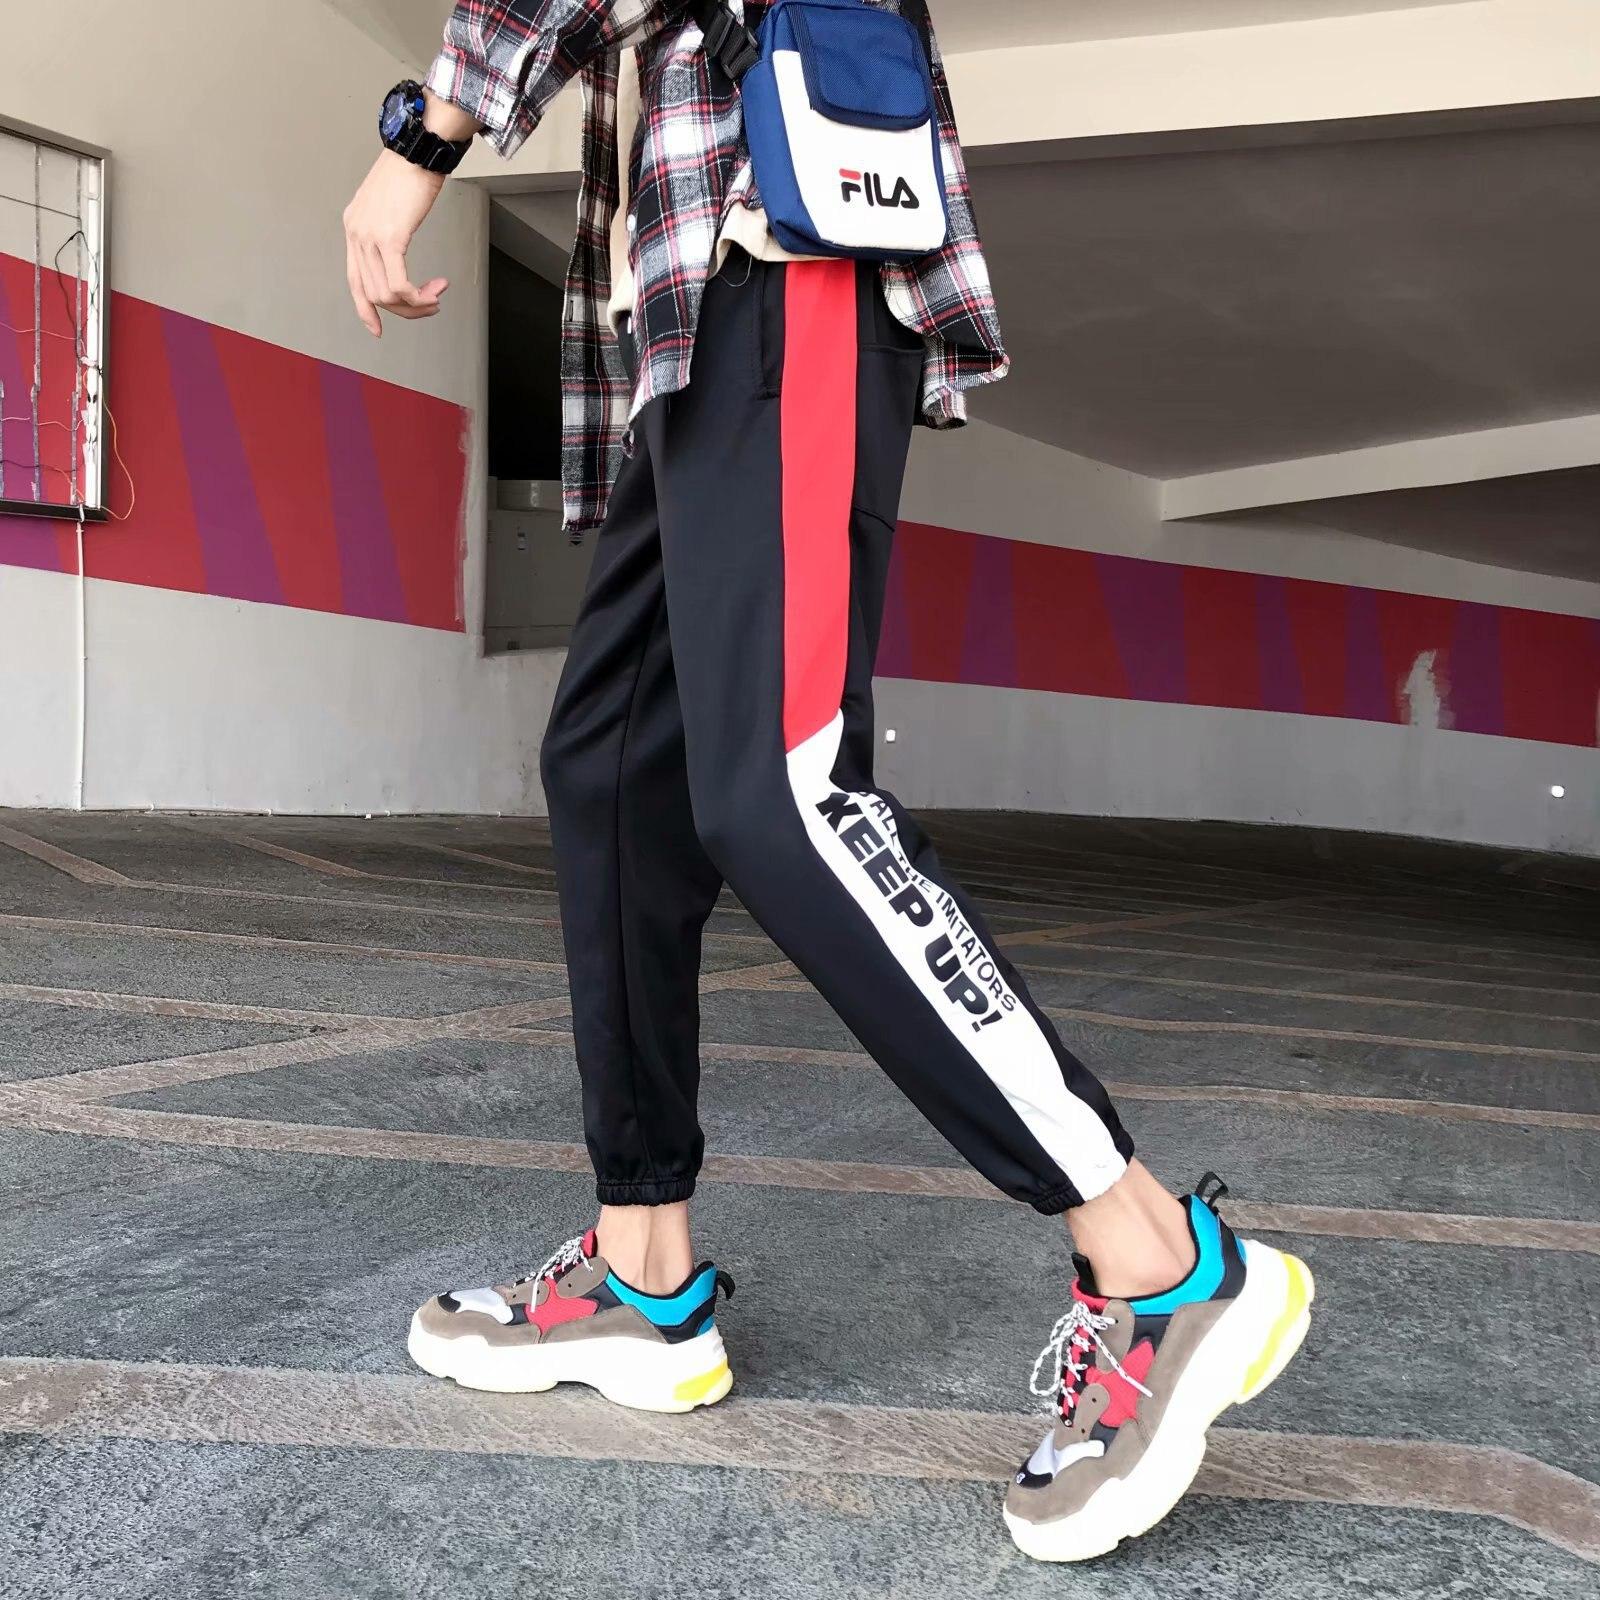 INS Super Fire Pants Men's Korean-style Trend Hip Hop Casual Capri Pants Harajuku BF Style Slim Fit Couples Transport